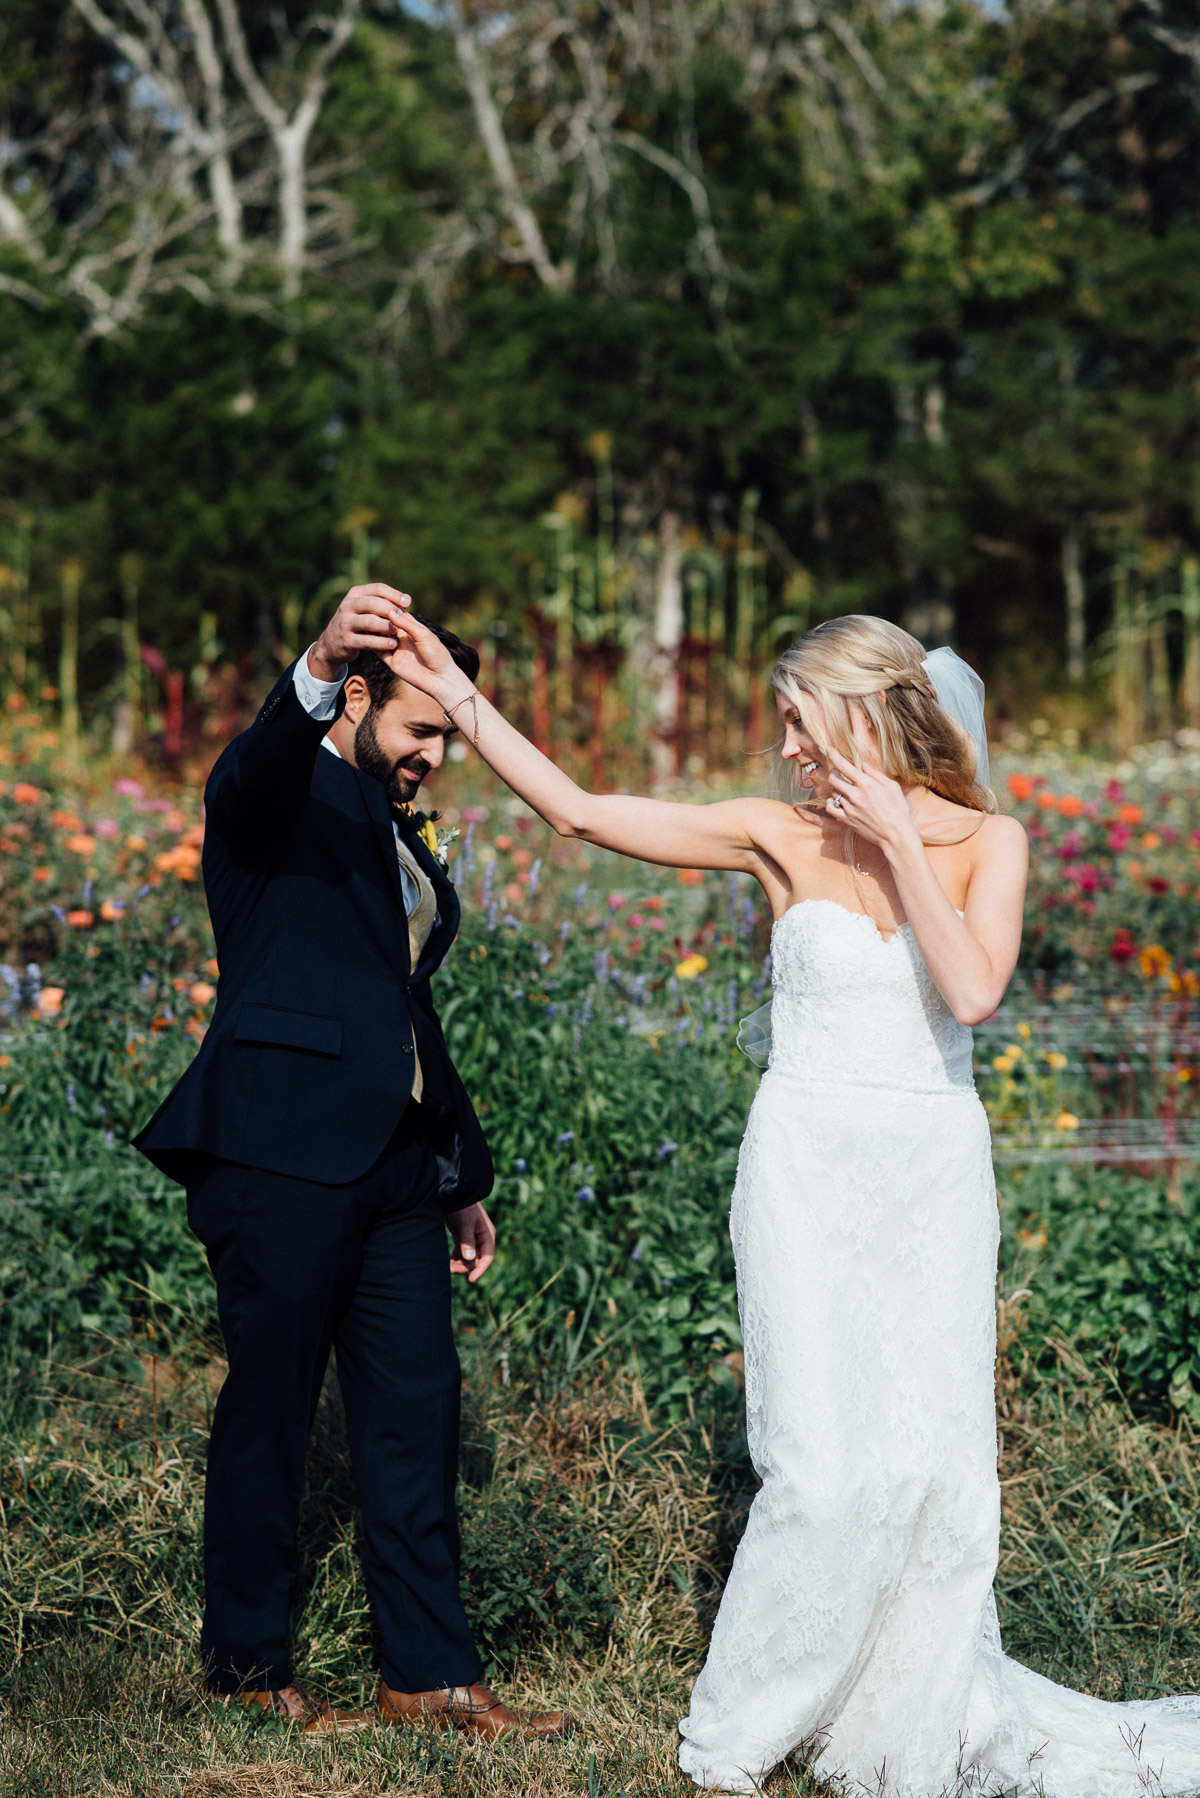 groom-twirling-bride Becky and Alex | Green Door Gourmet - Fall Nashville Wedding